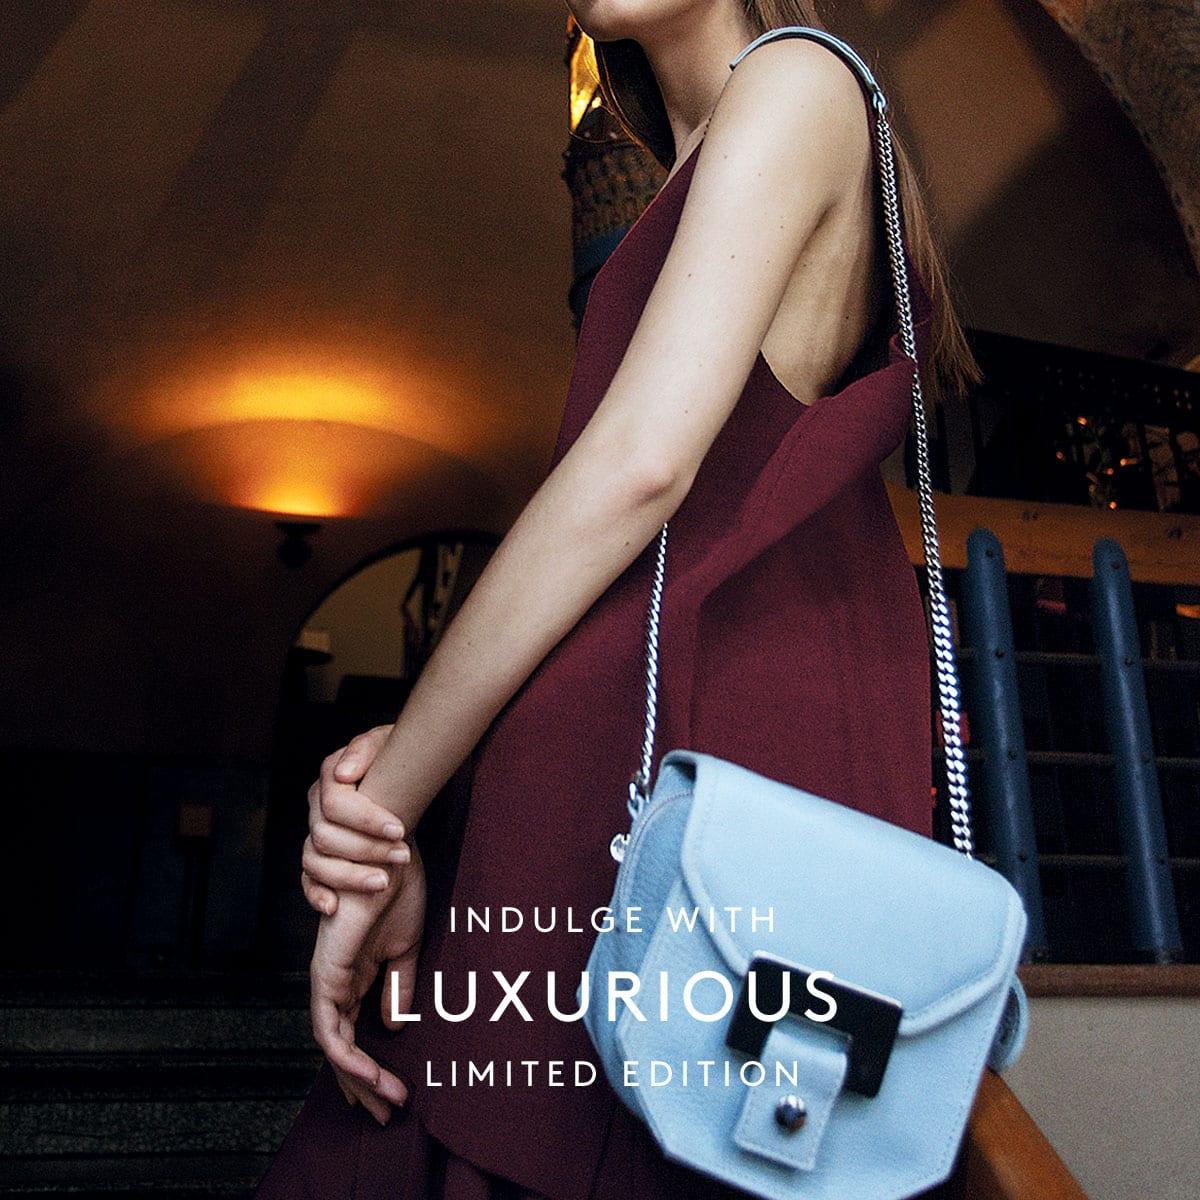 LUMI Luxurious Limited Edition